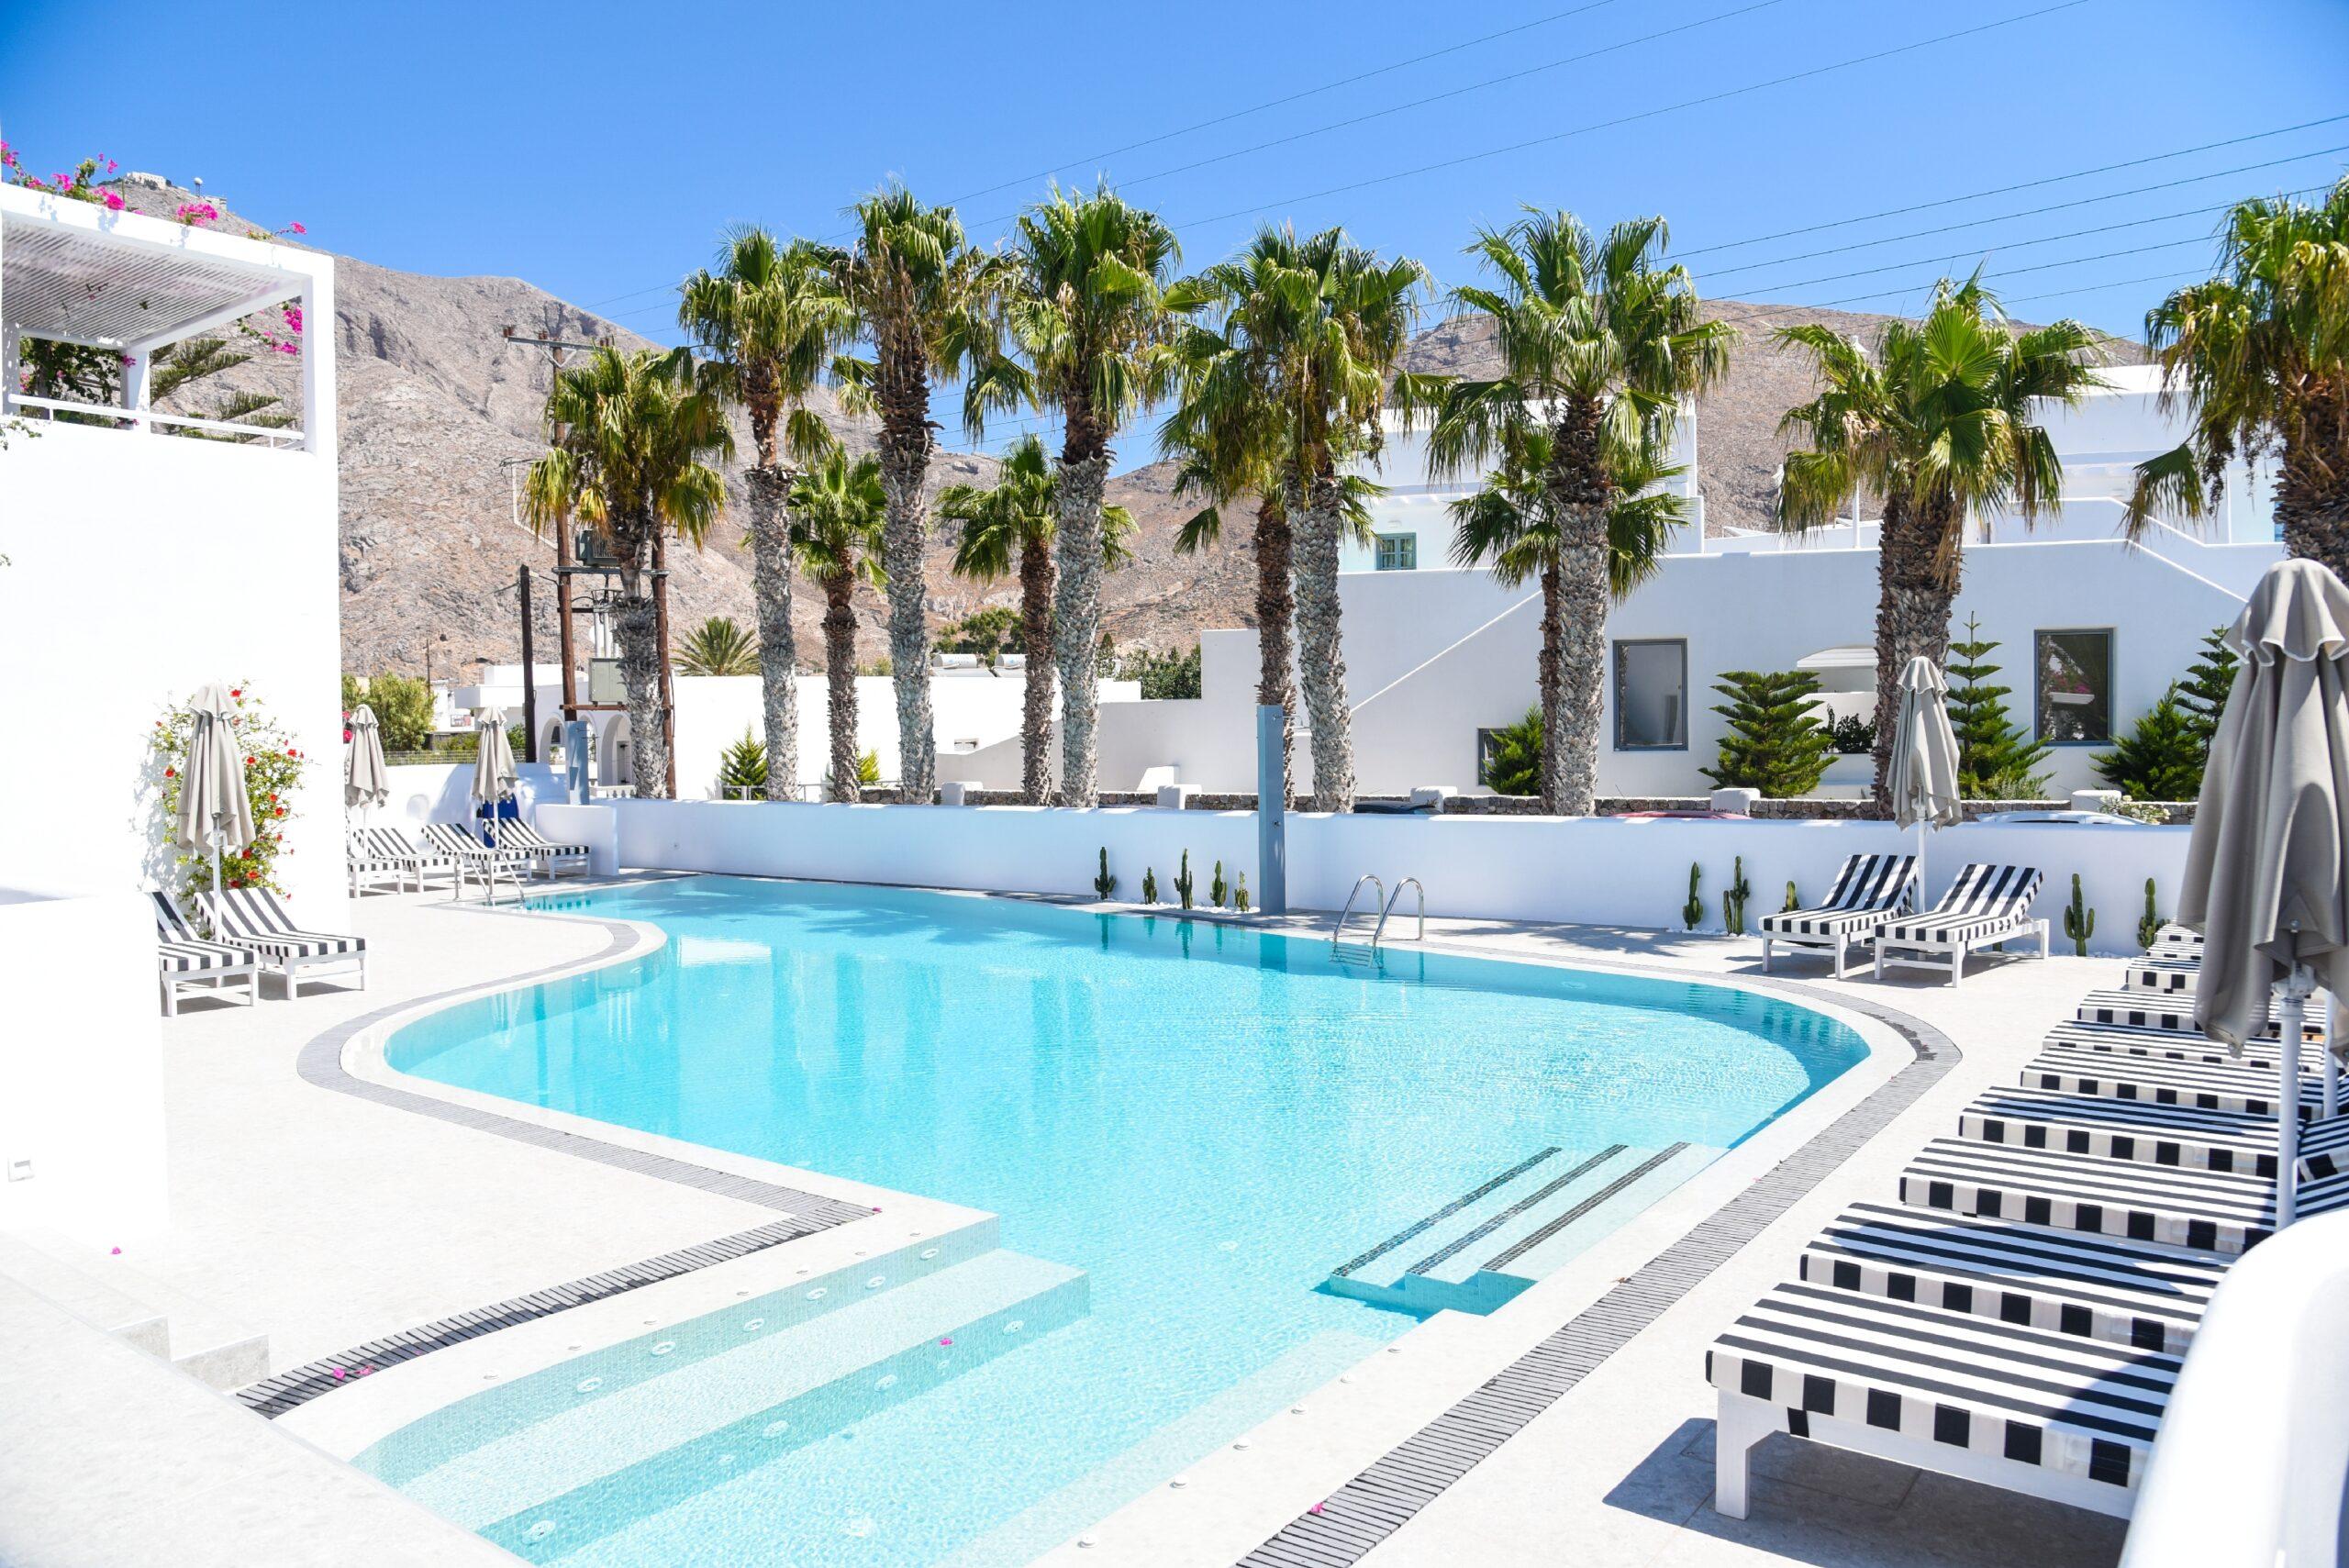 Kouros Village Hotel - Pool area - Perissa Beach Santorini